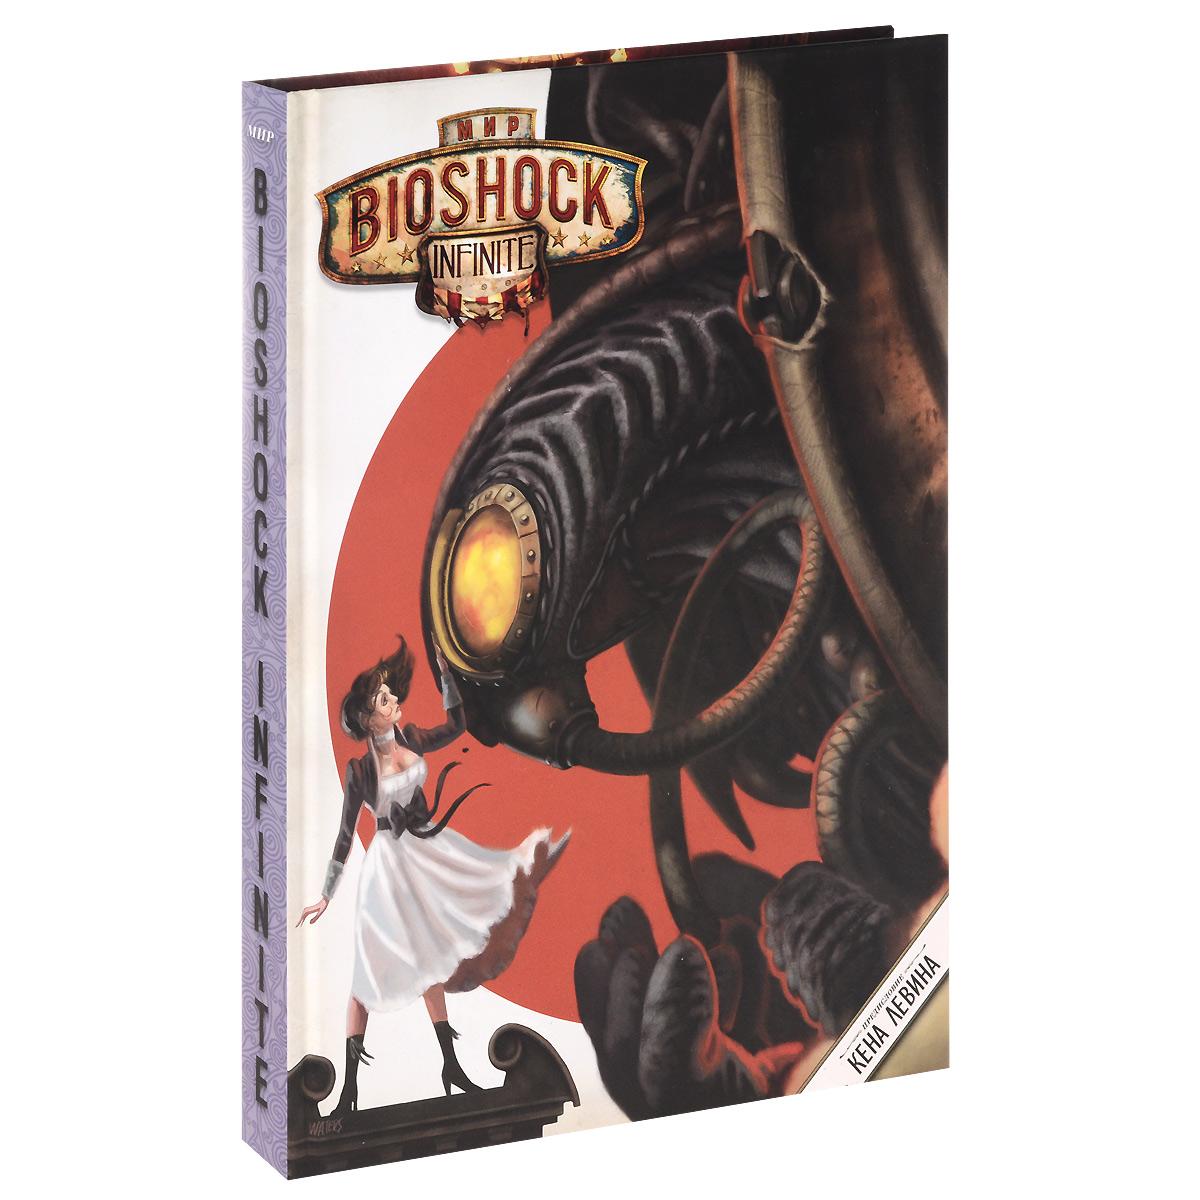 Мир Bioshock Infinite bioshock infinite цифровая версия